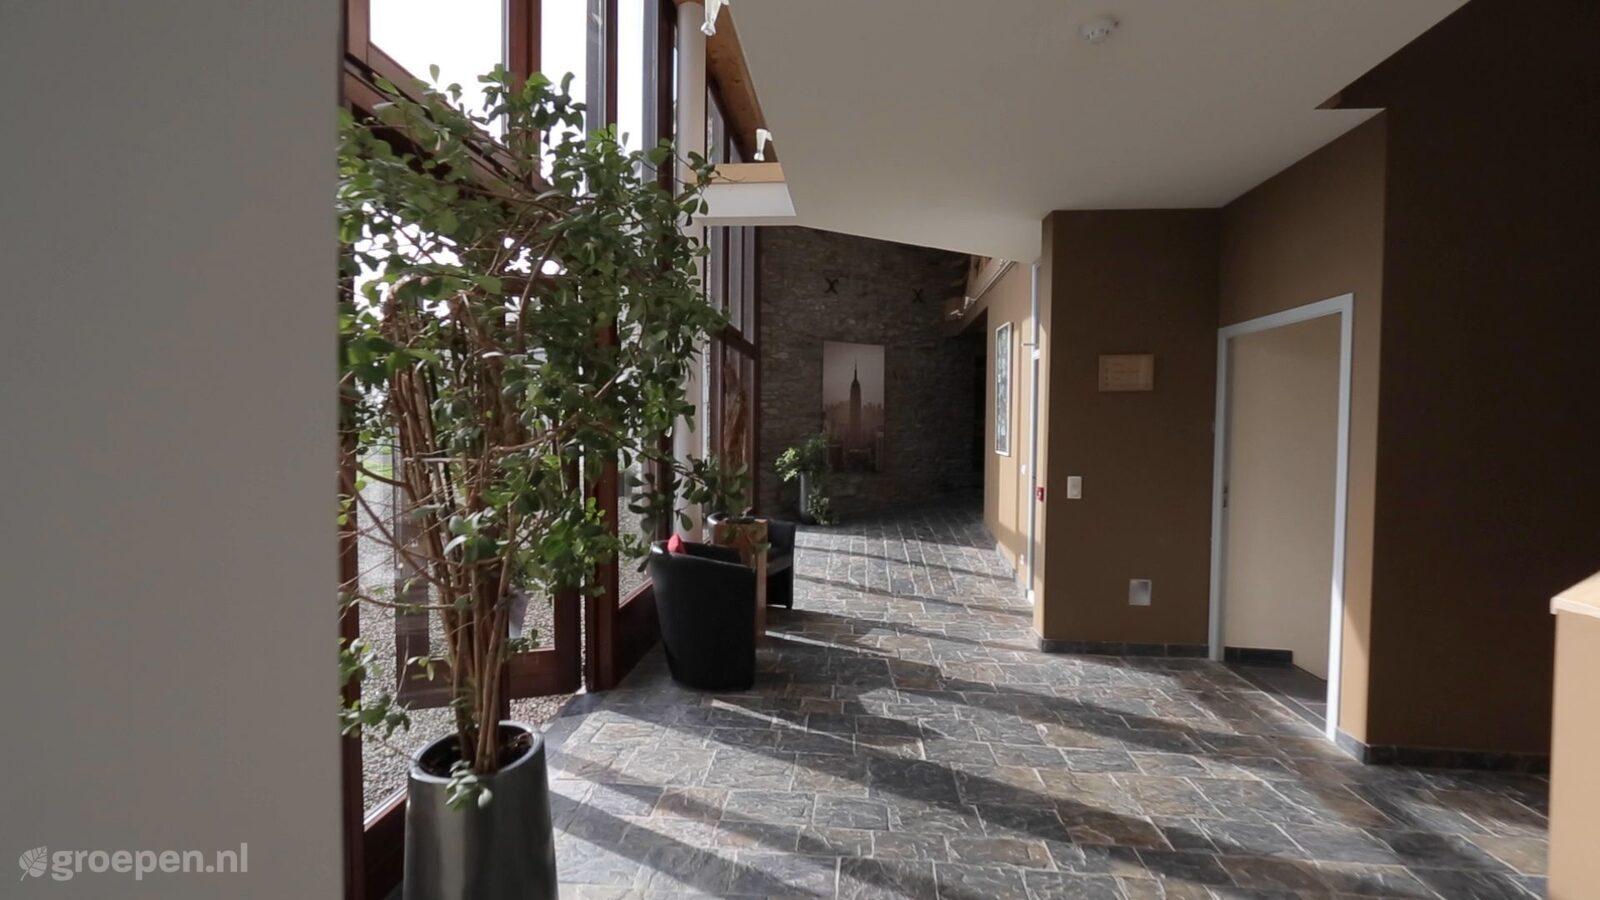 Group accommodation Hubermont